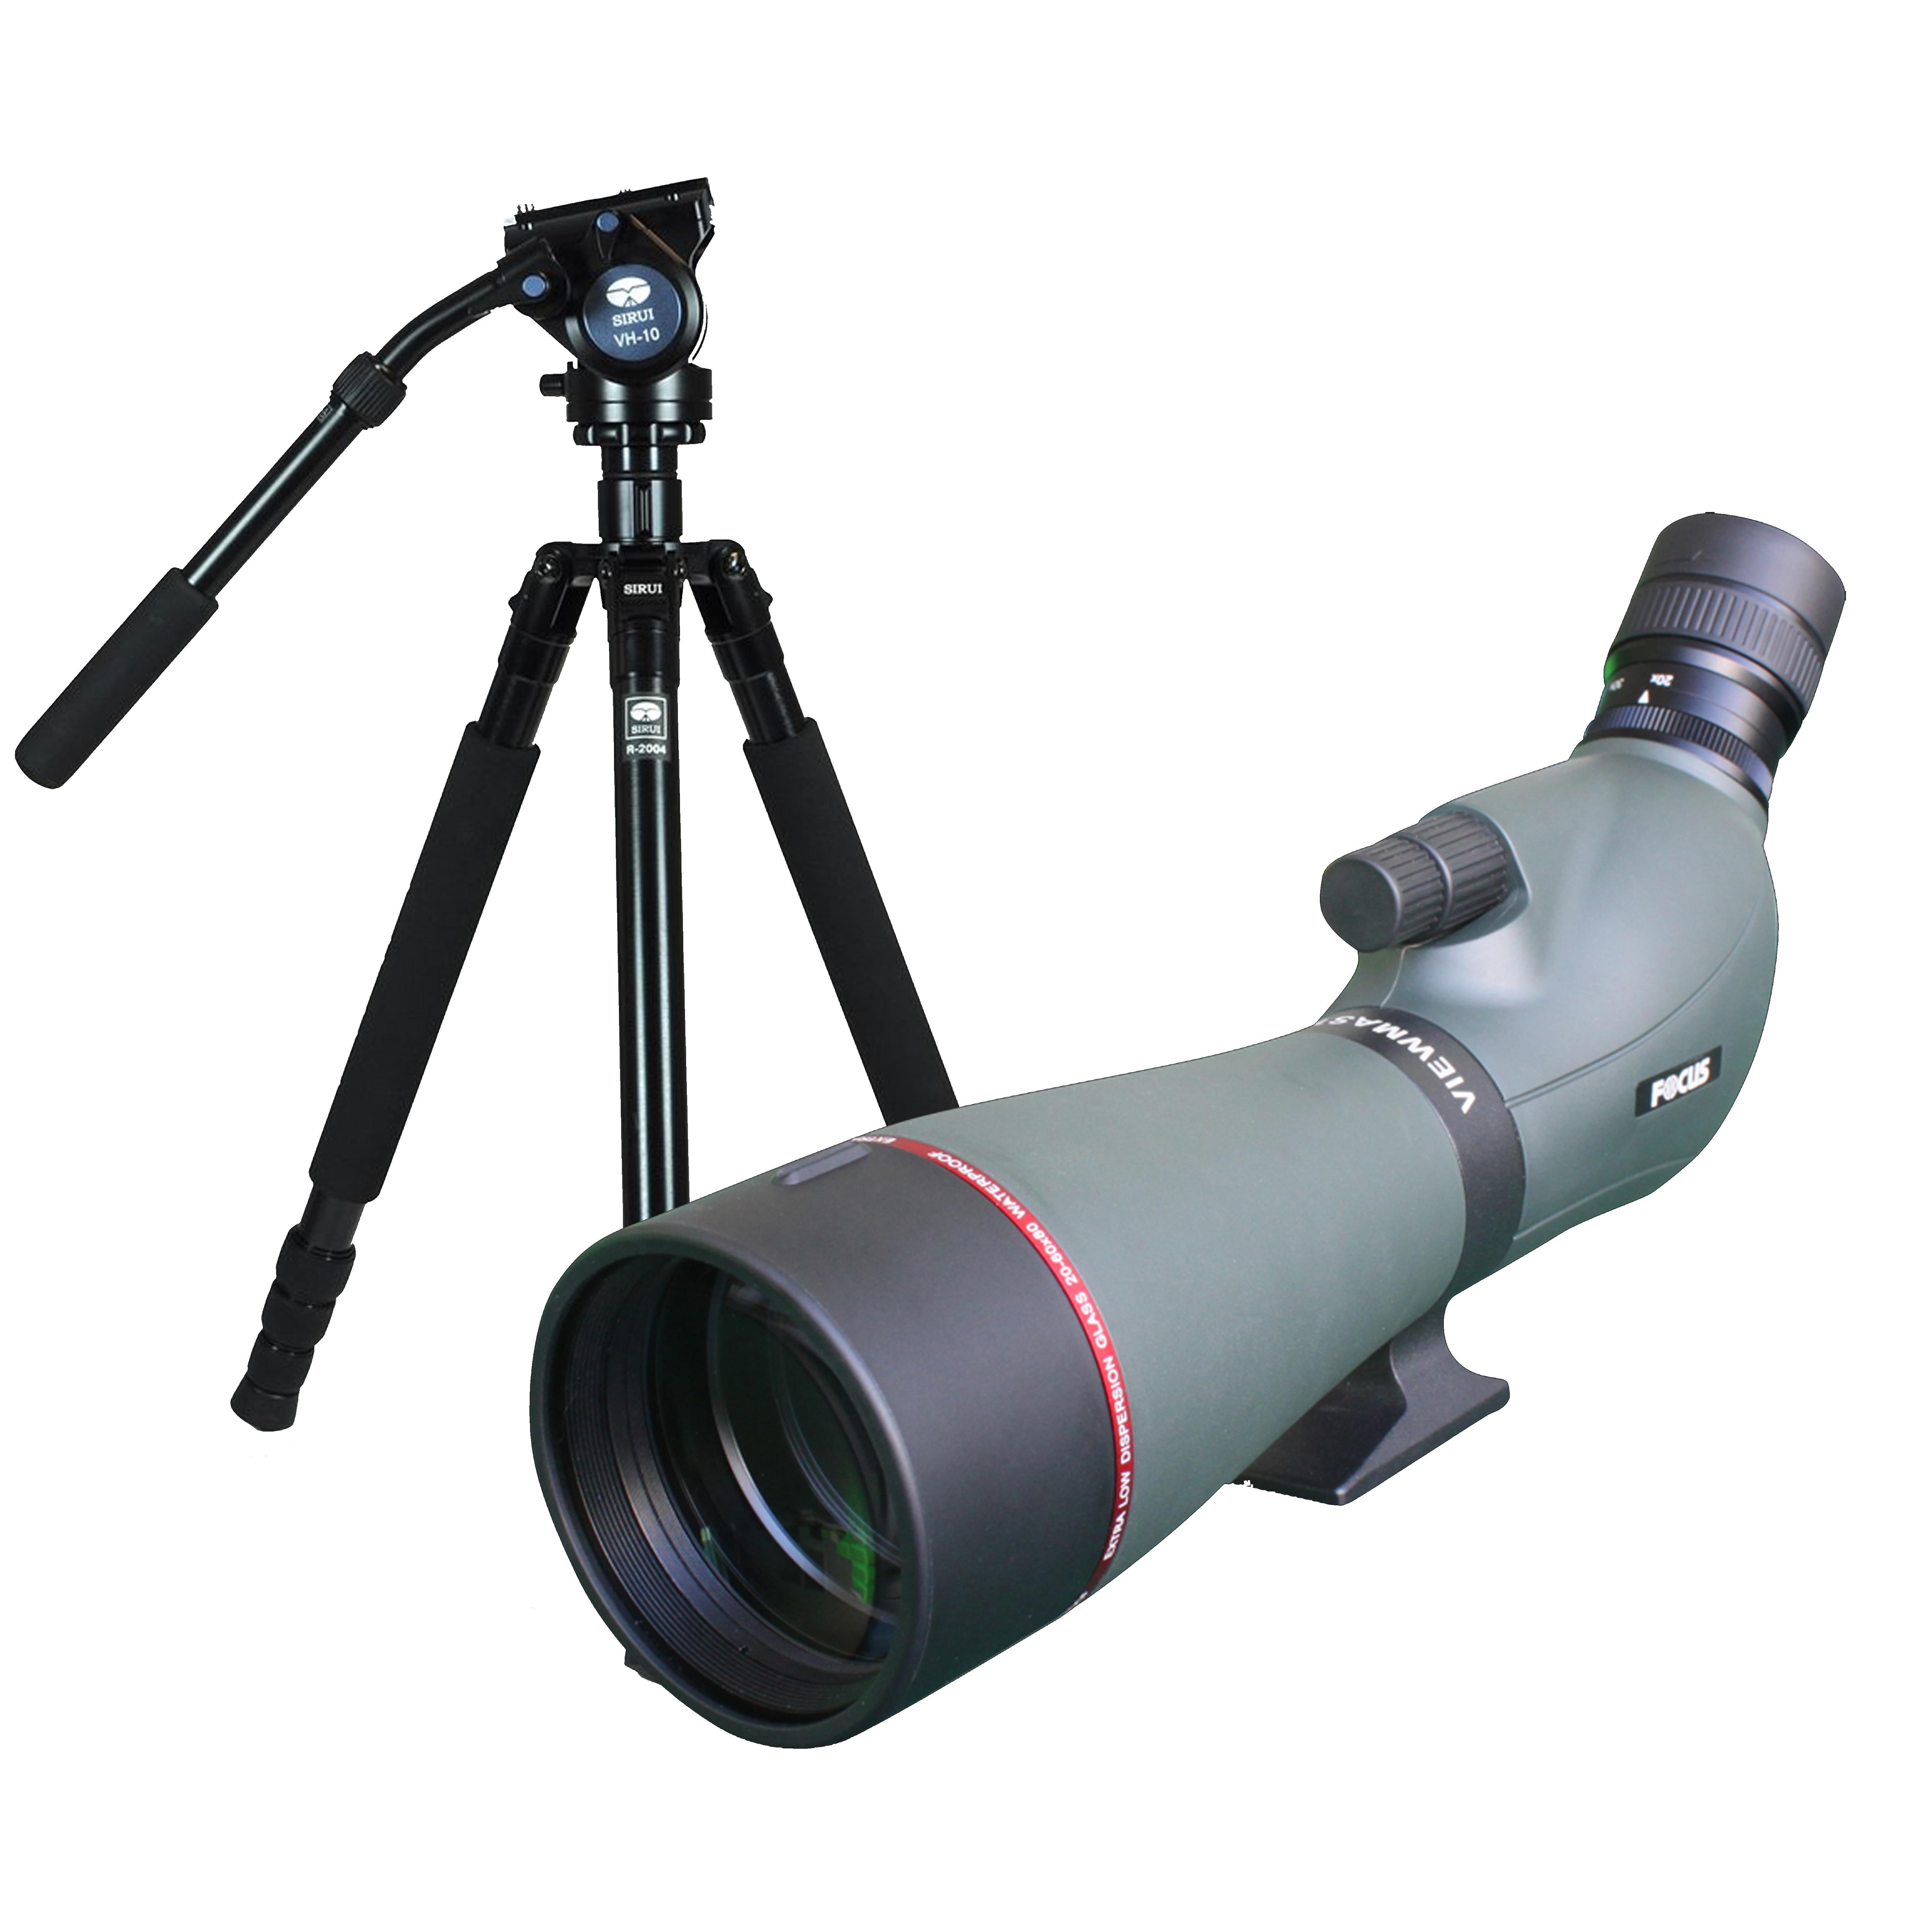 Focus Viewmaster 20-60x80 + Sirui R-2004+VH10